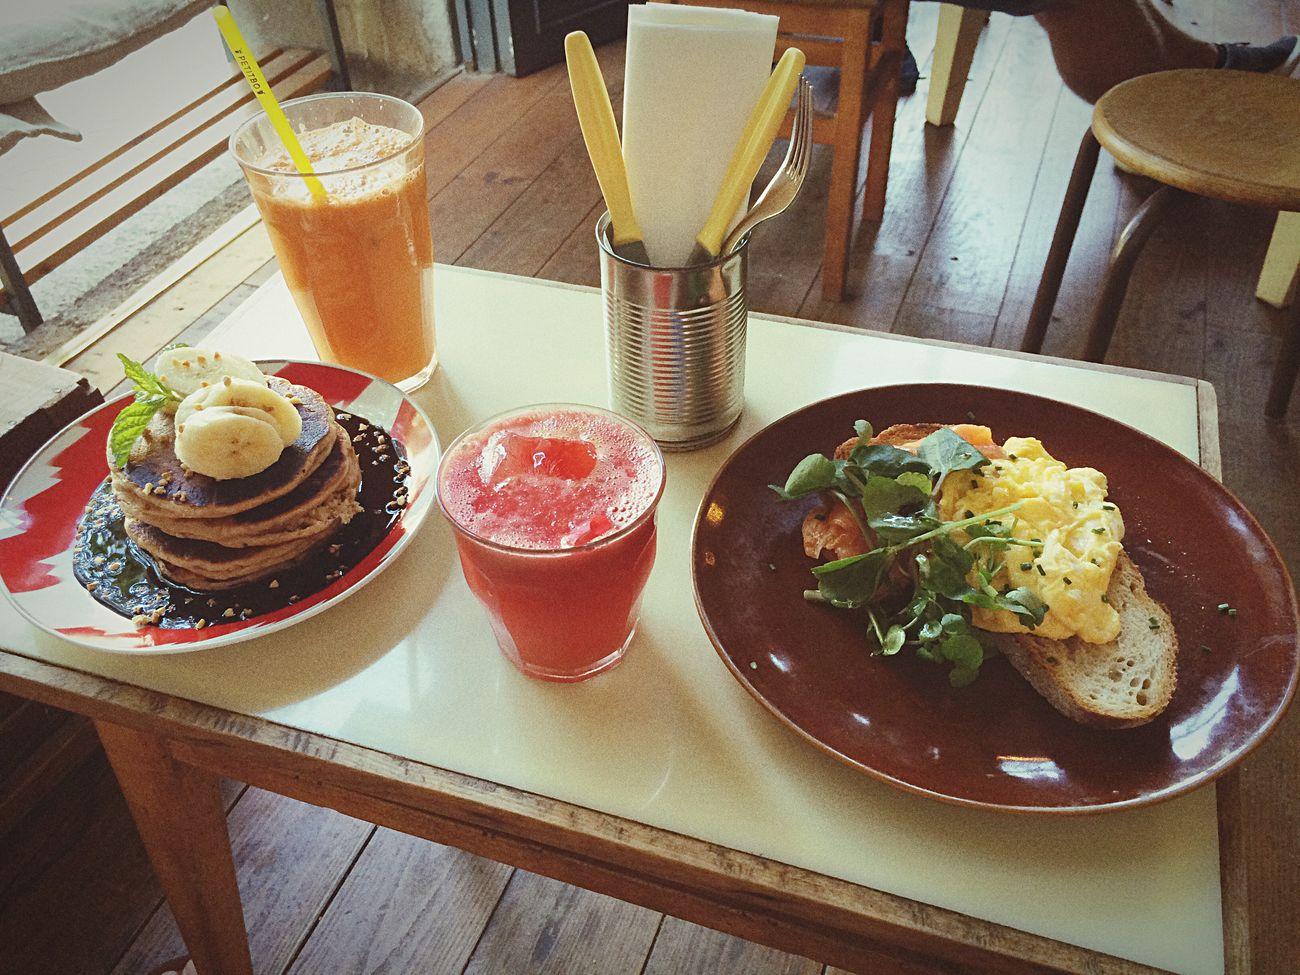 Barcelona Granjapetitbo Breakfast Freshjuice Smoked Salmon  Scrumbleeggs Watermelonjuice Orangejuice Pancakes